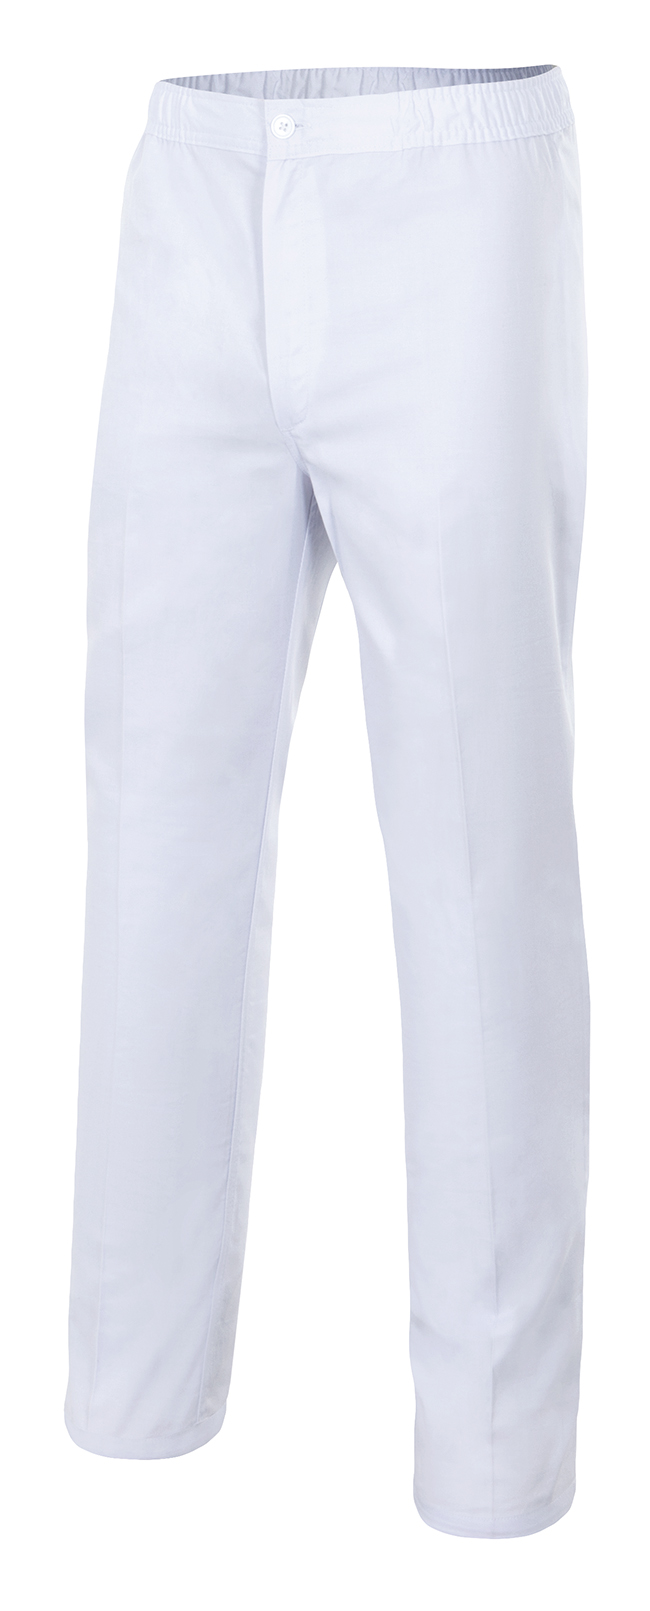 Pantalón Pijama Velilla Serie 335